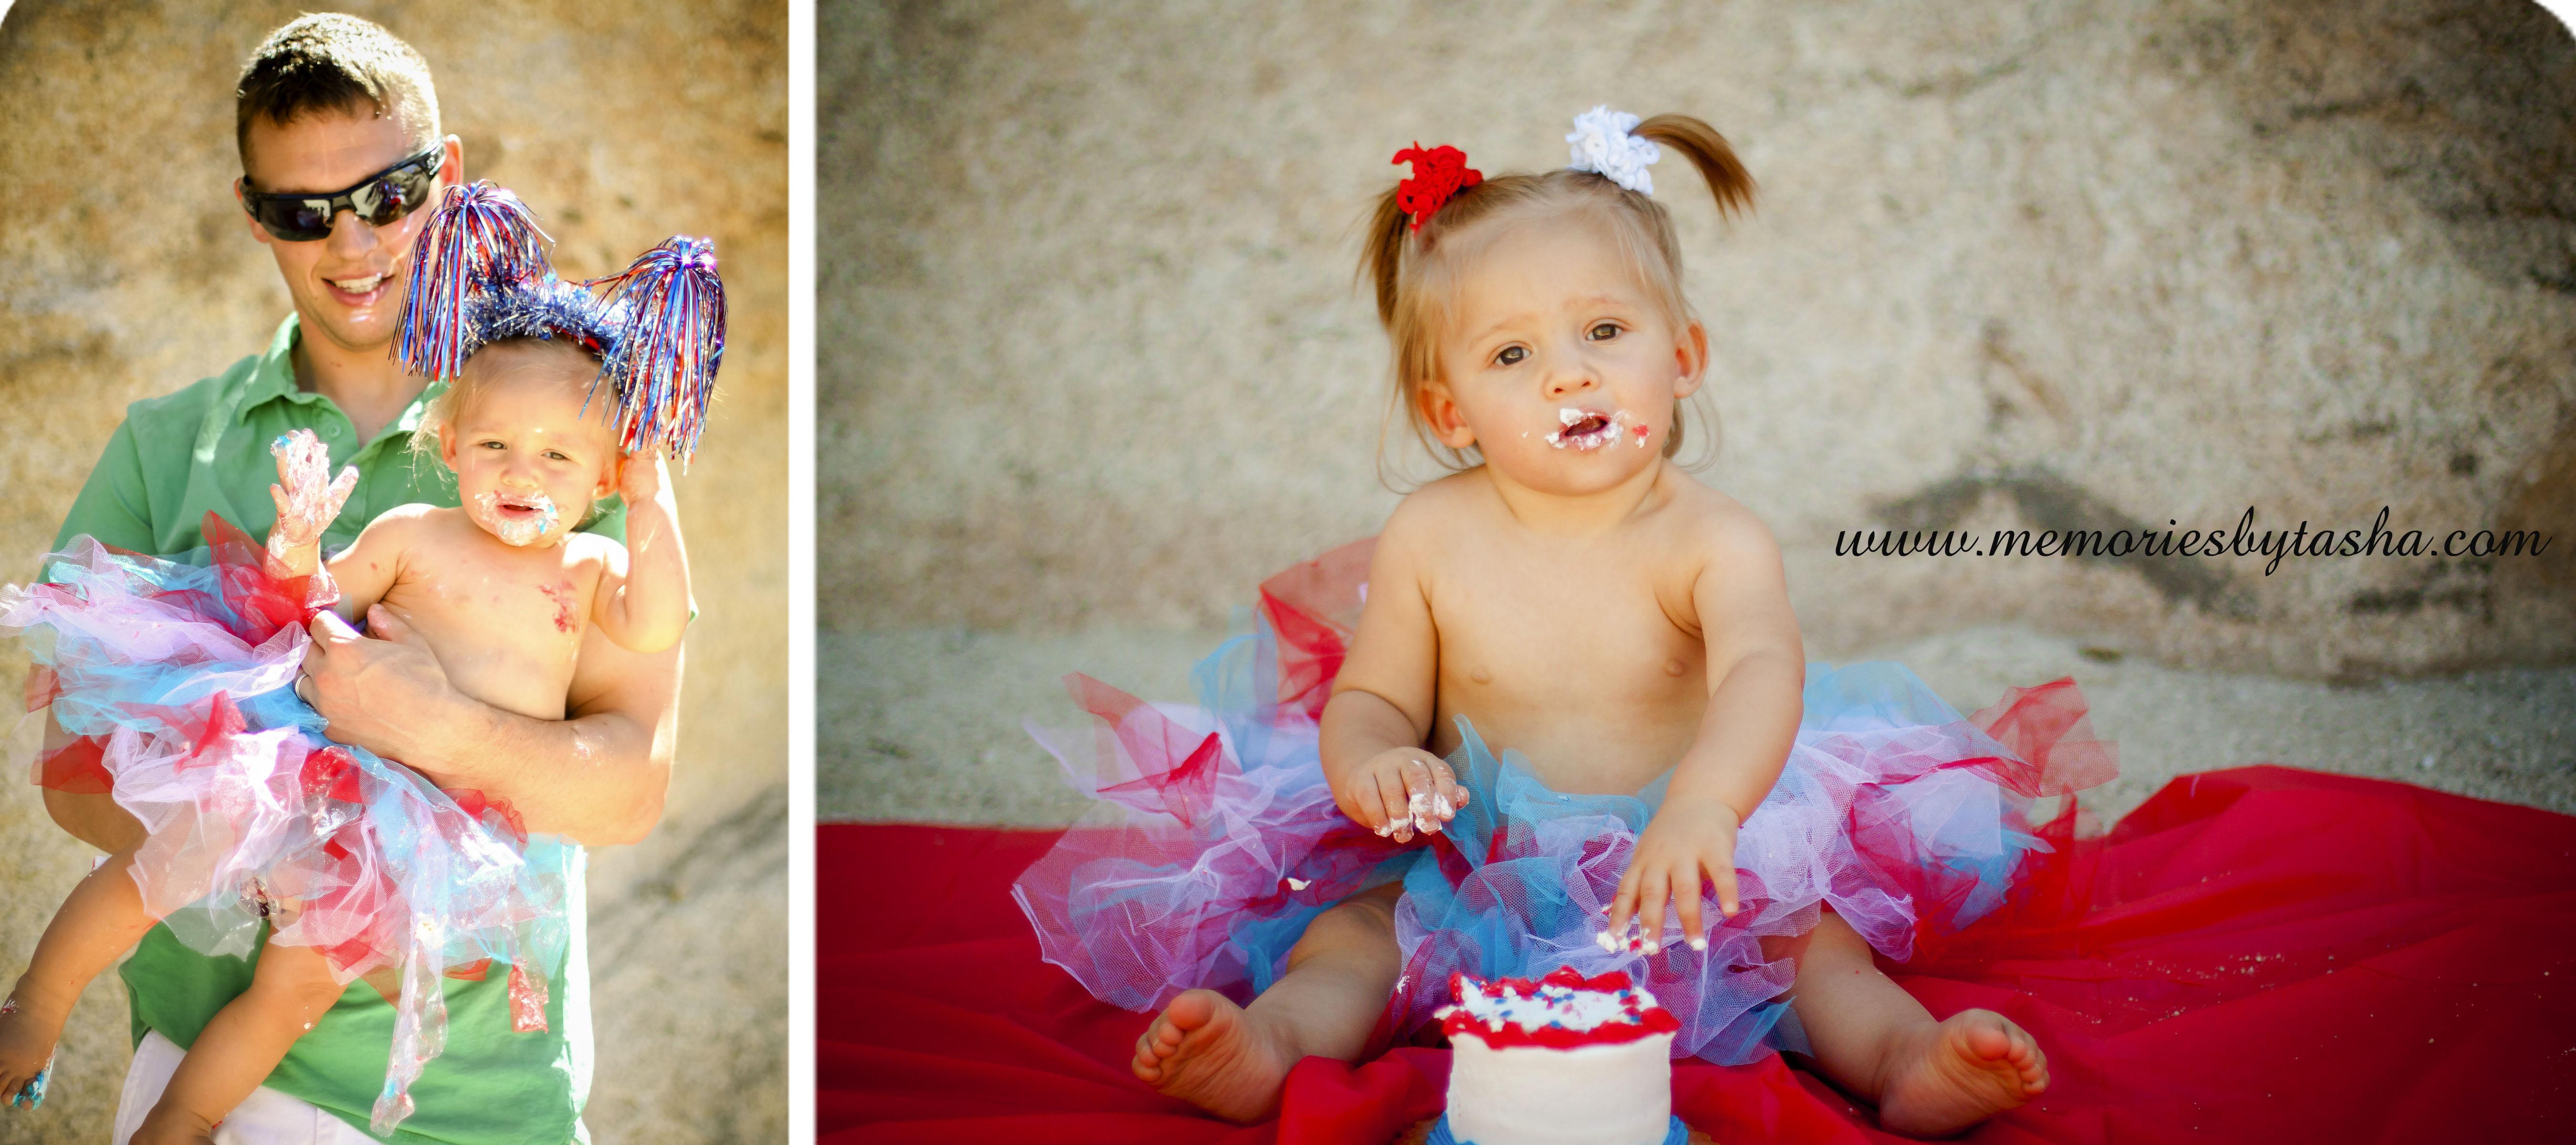 Twentynine Palms Photographer - Couples Photography - Family Photography - Children's Photography - Cake Smash-06